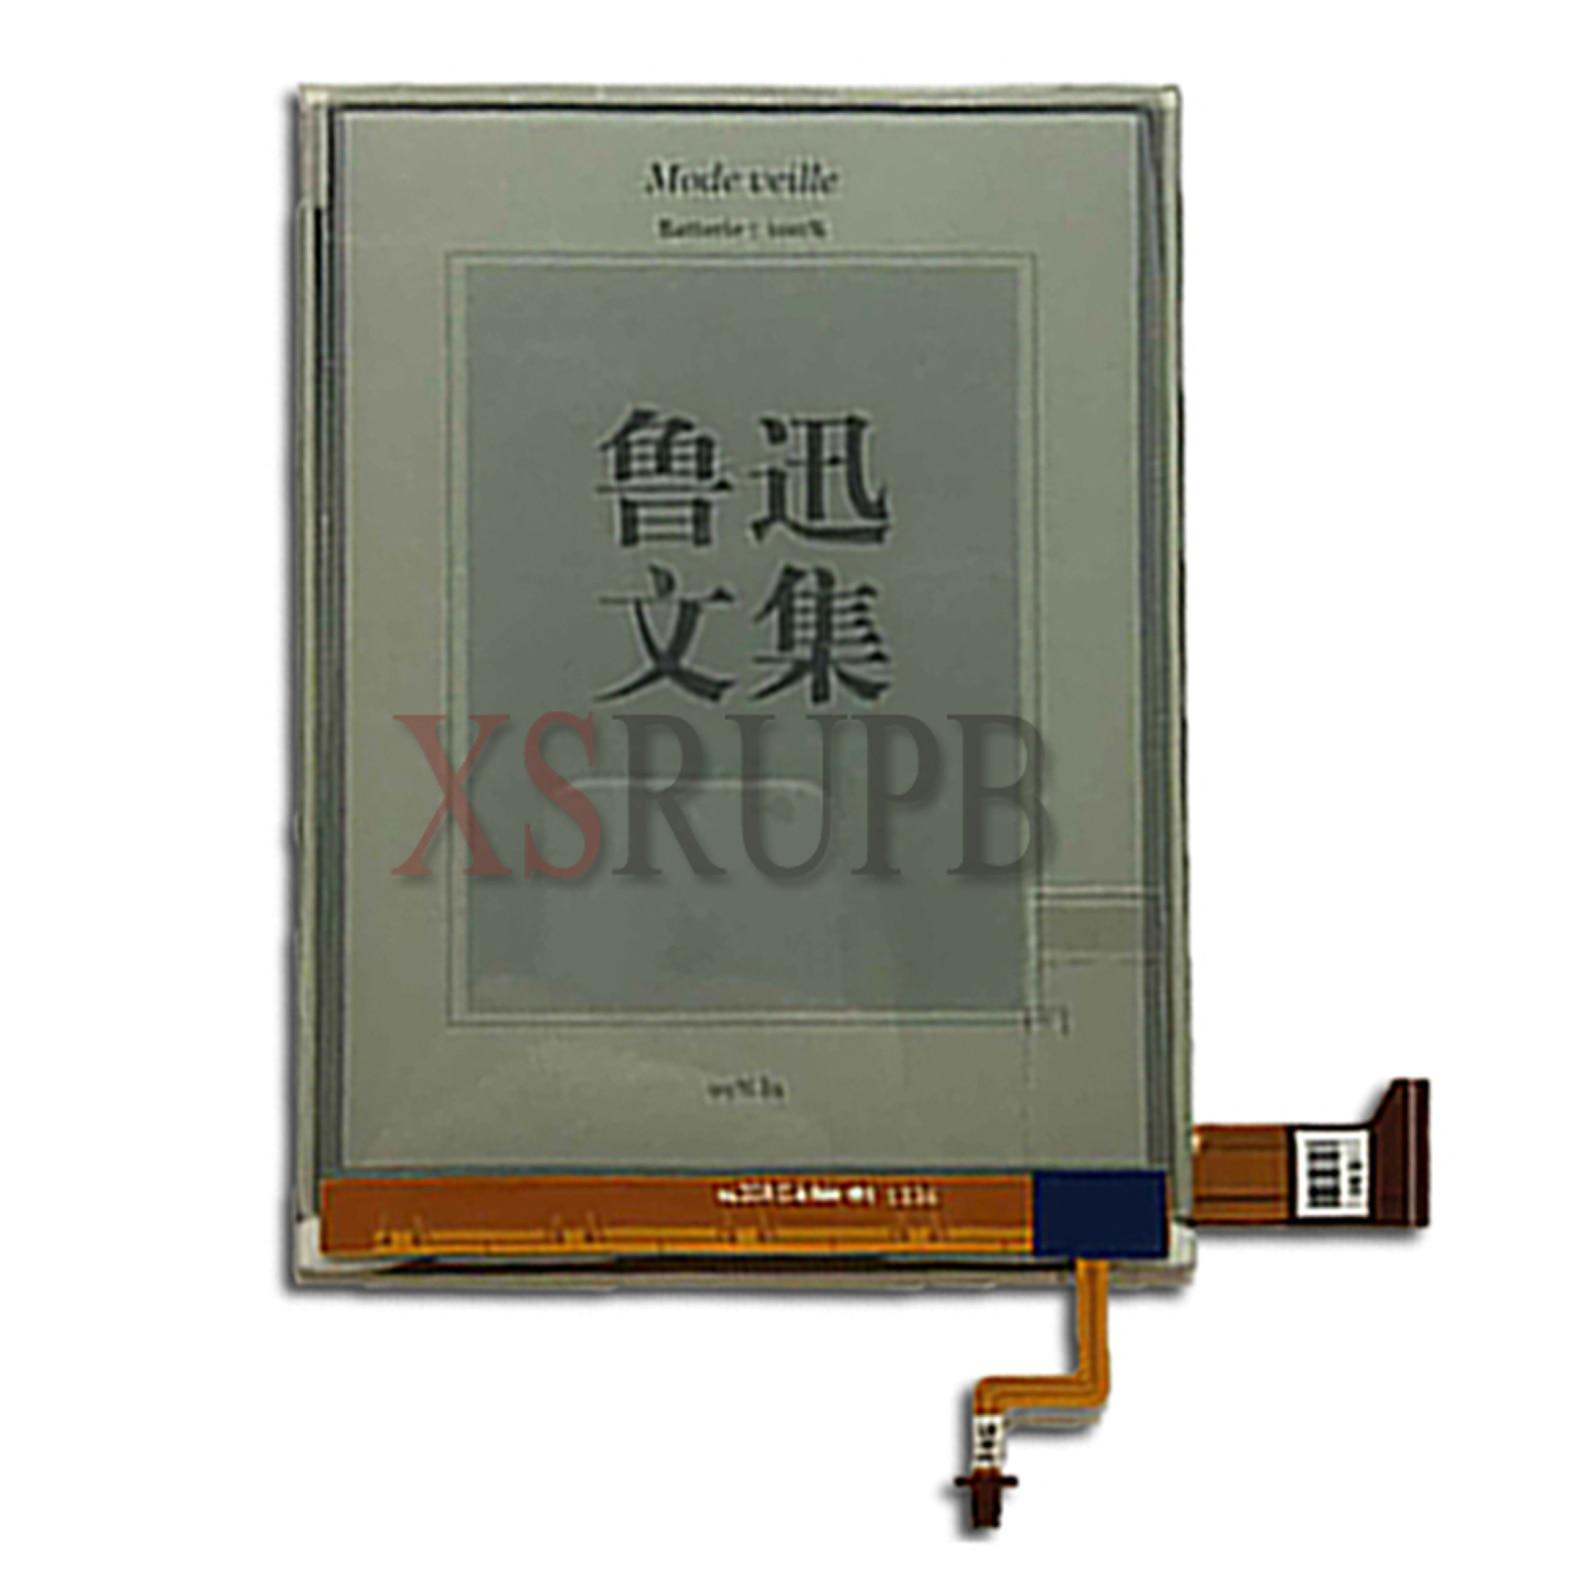 100% original 6-inch HD ED060XG3 ED060XG3(LF)T1-00 LCD for E-book readers LCD display(Not use pocketbook)